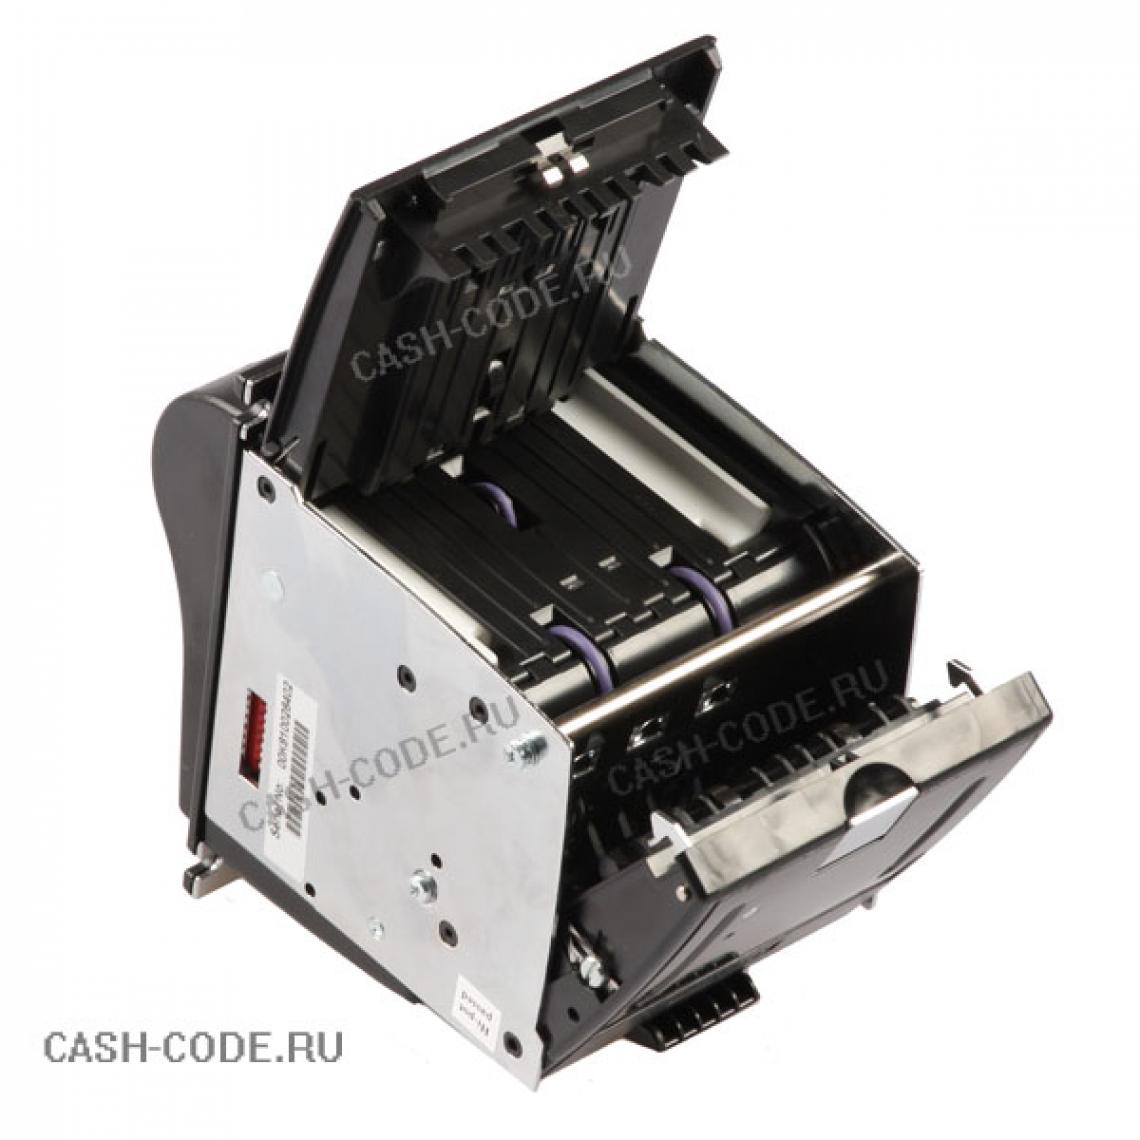 cashcodeMVU_3